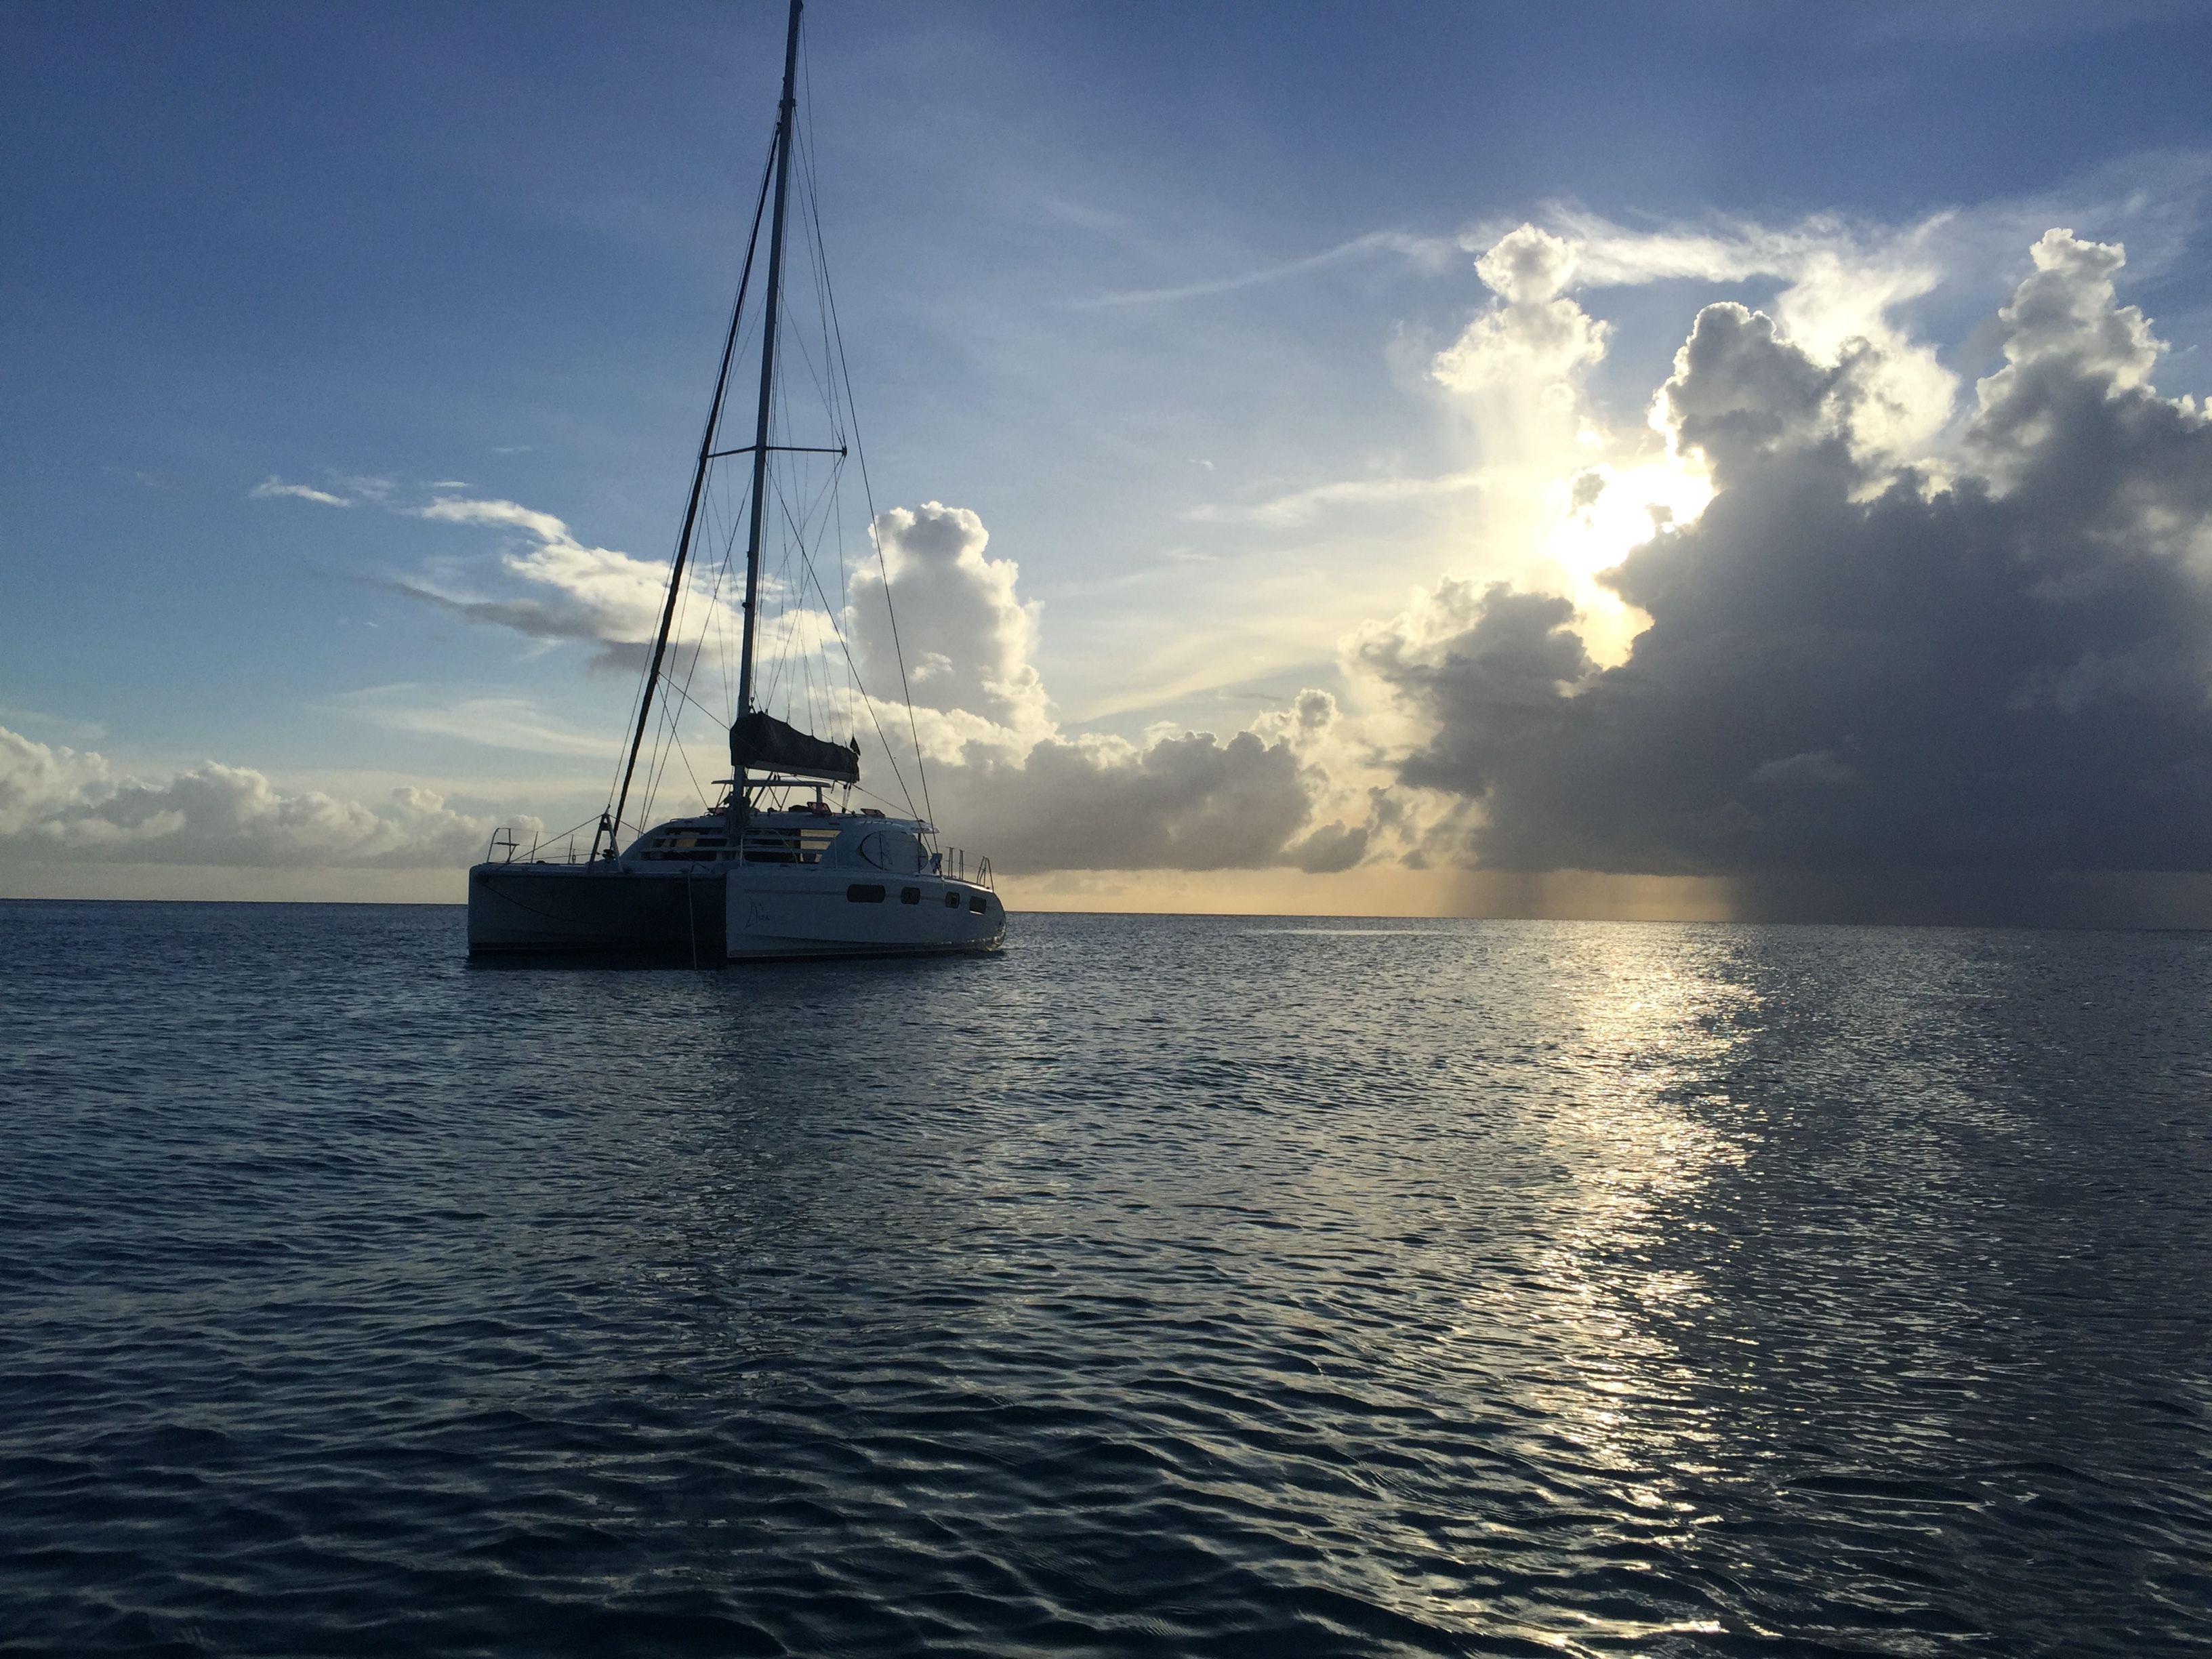 Sunset catamaran ride